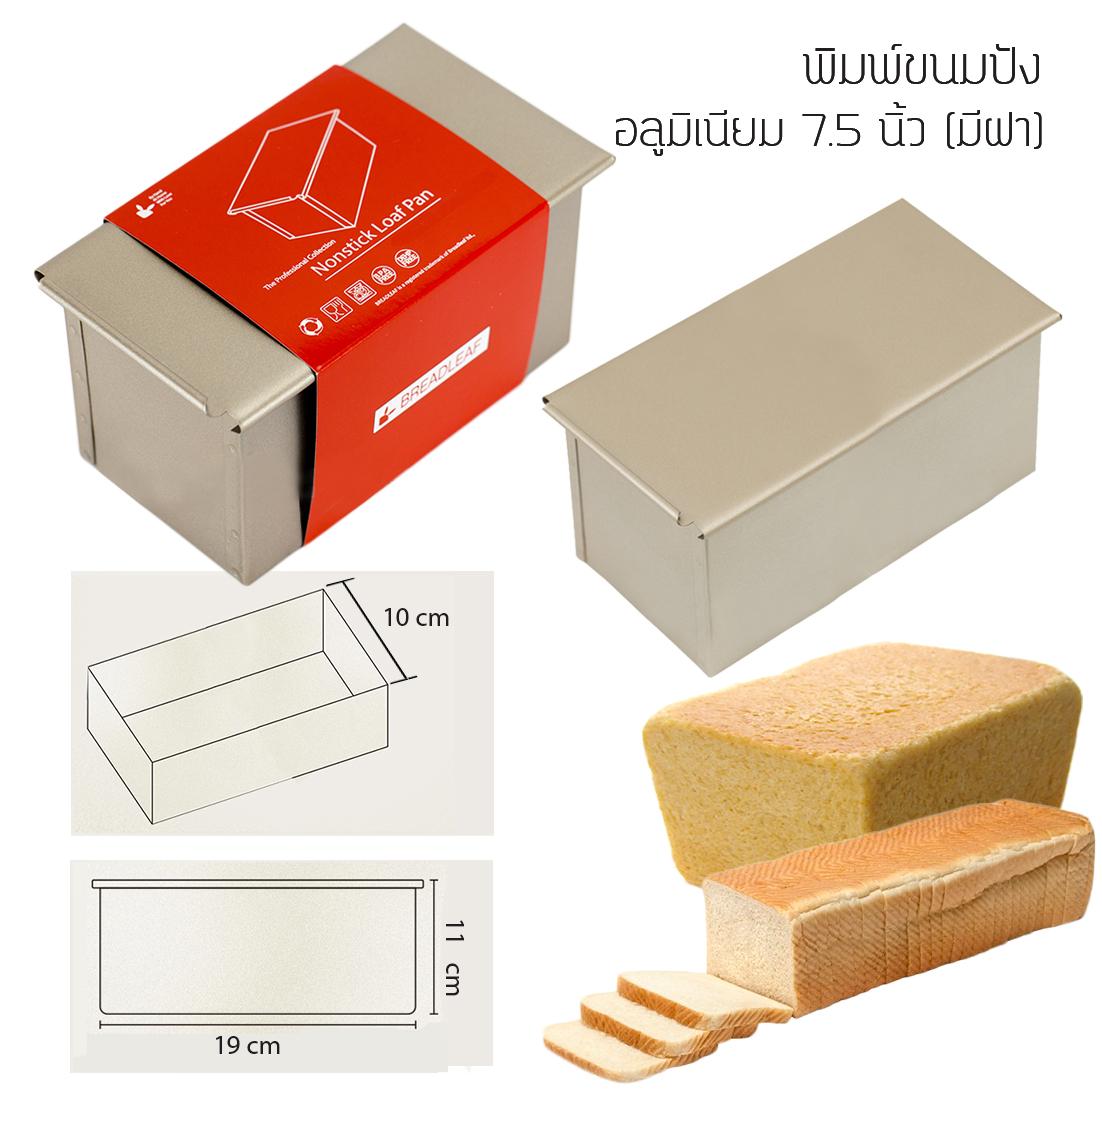 Breadleaf Non Stick Loaf Pan พิพม์อบขนมปัง+ฝา 19x10x11cm